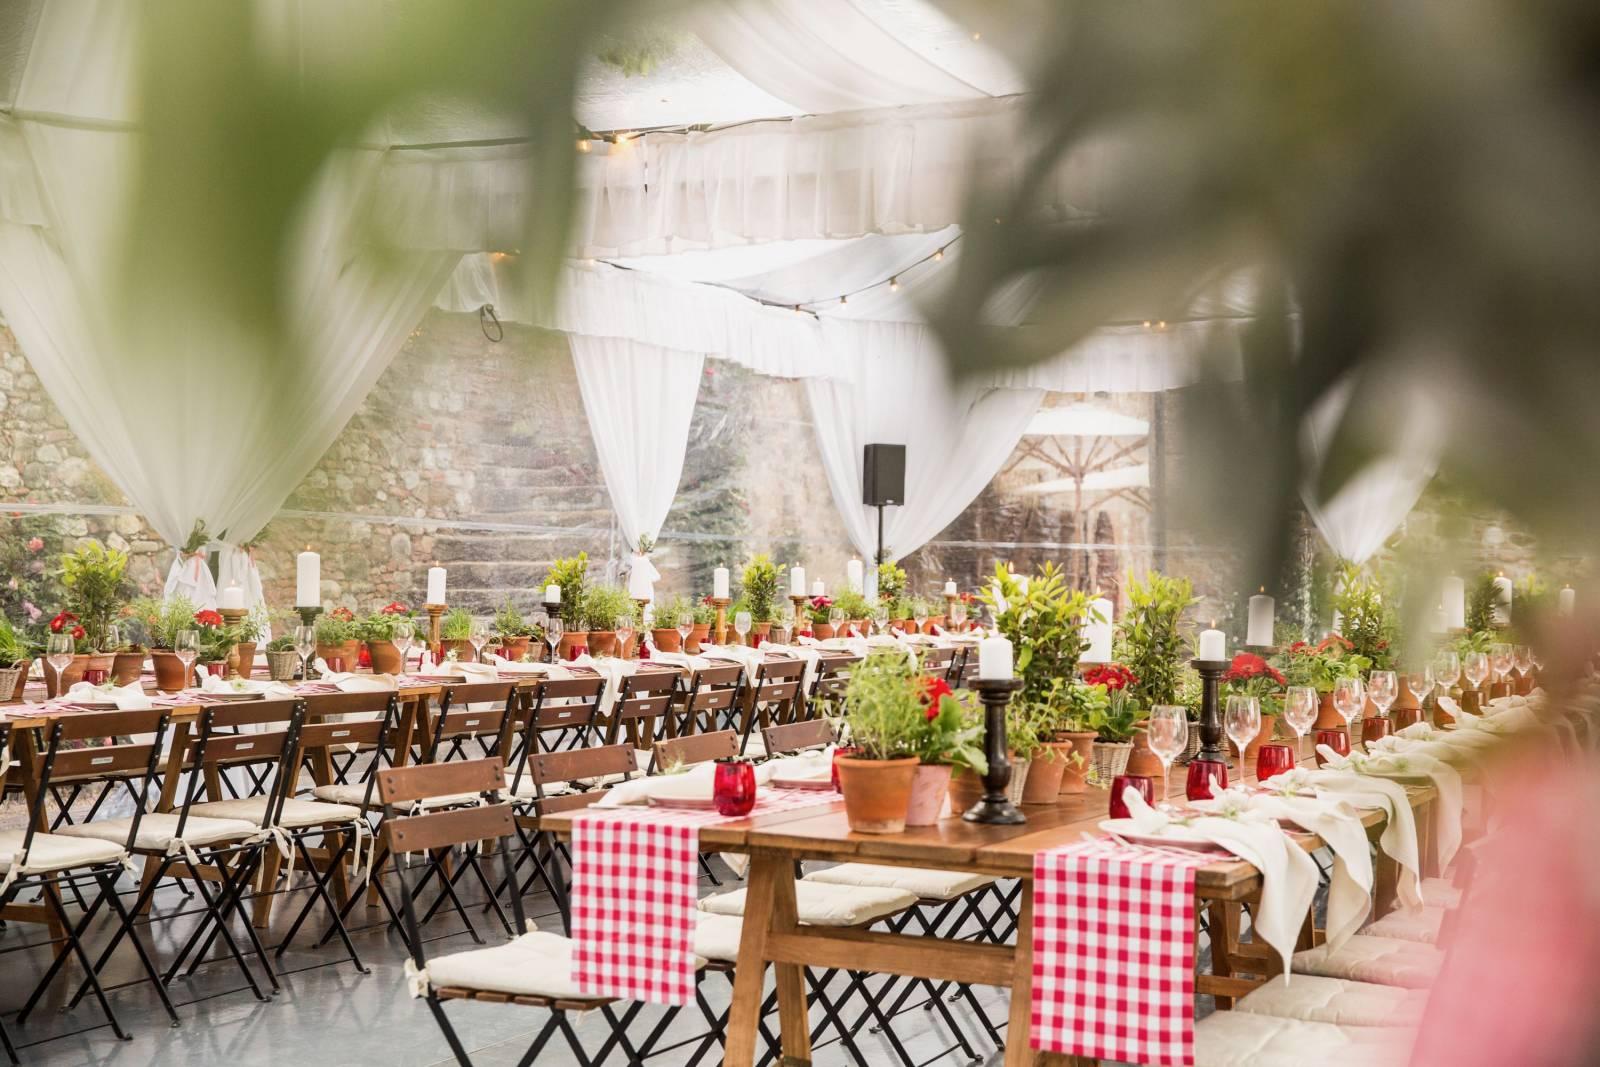 Feriatus - Wedding Planner - Event Planner - House of Weddings - 26